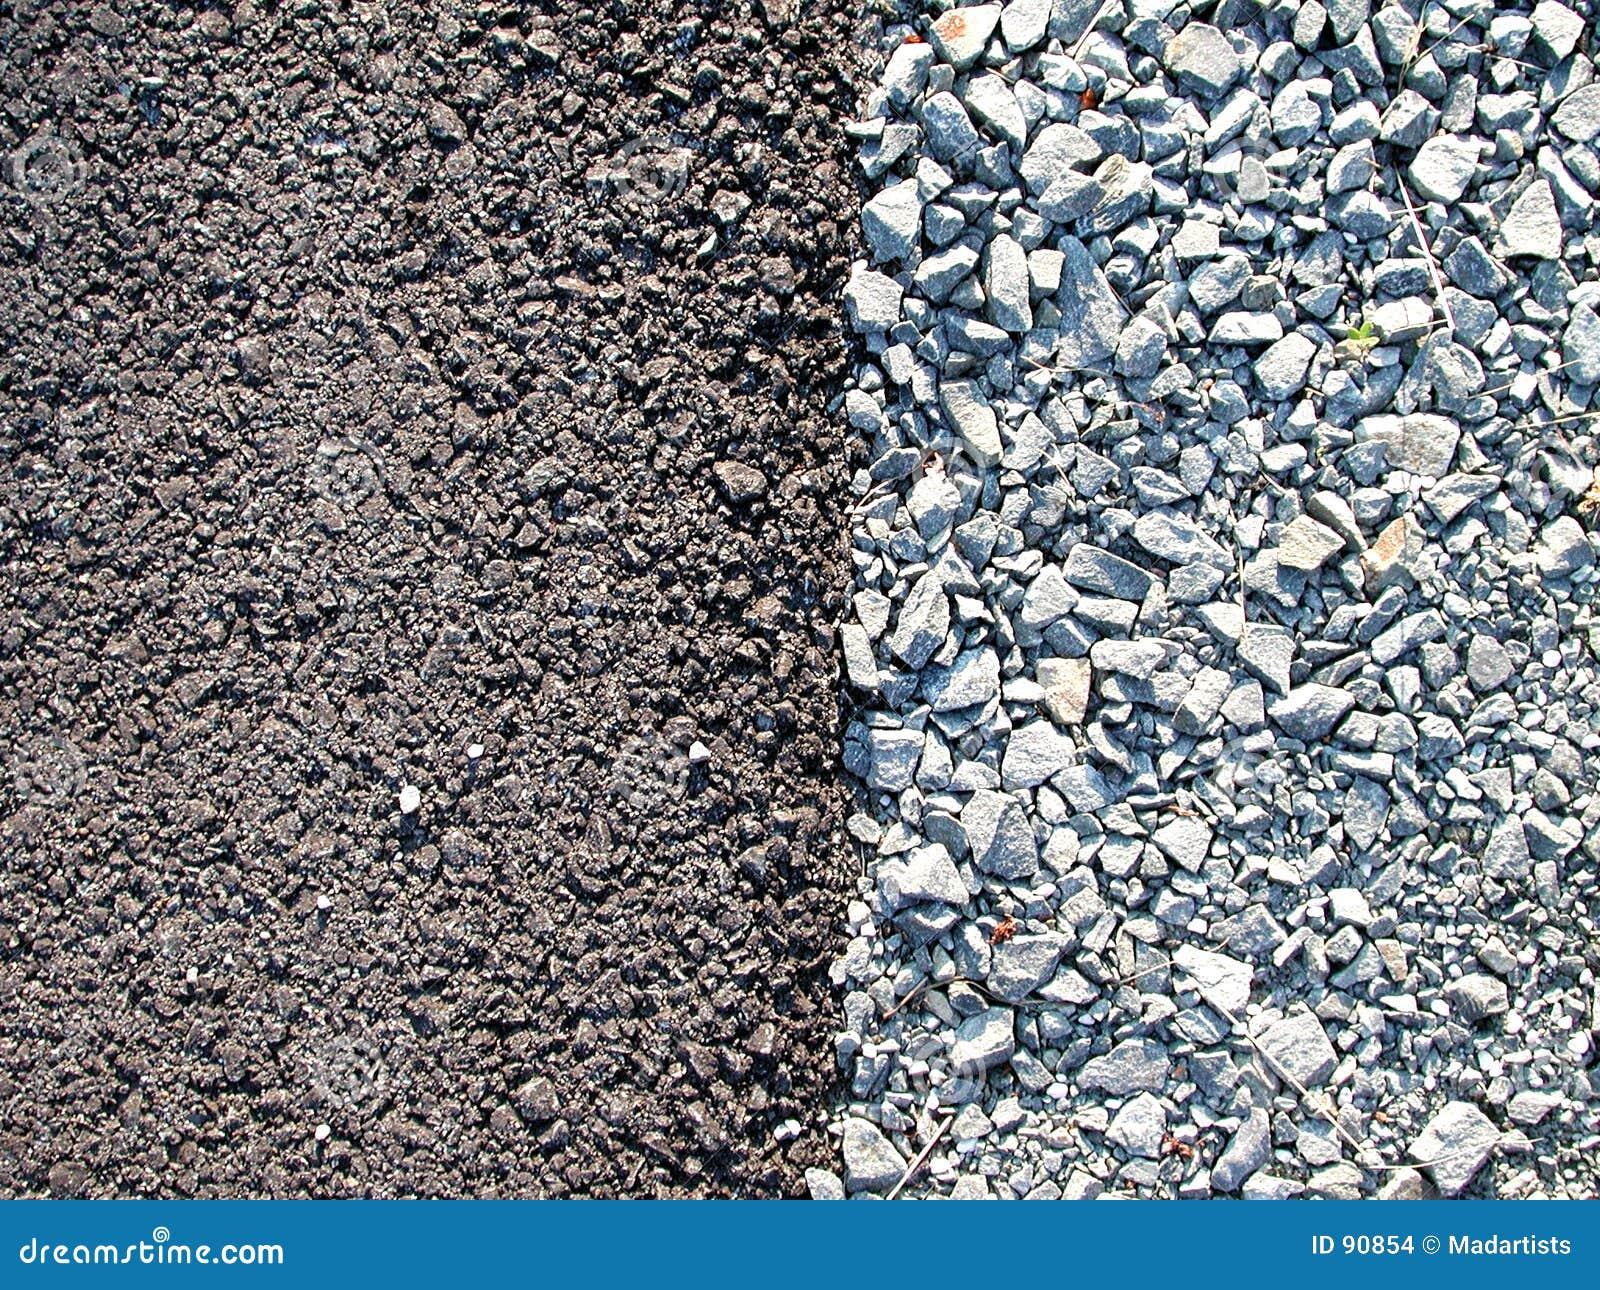 Cement Gravel Rocks Textures Stock Photo Image 90854